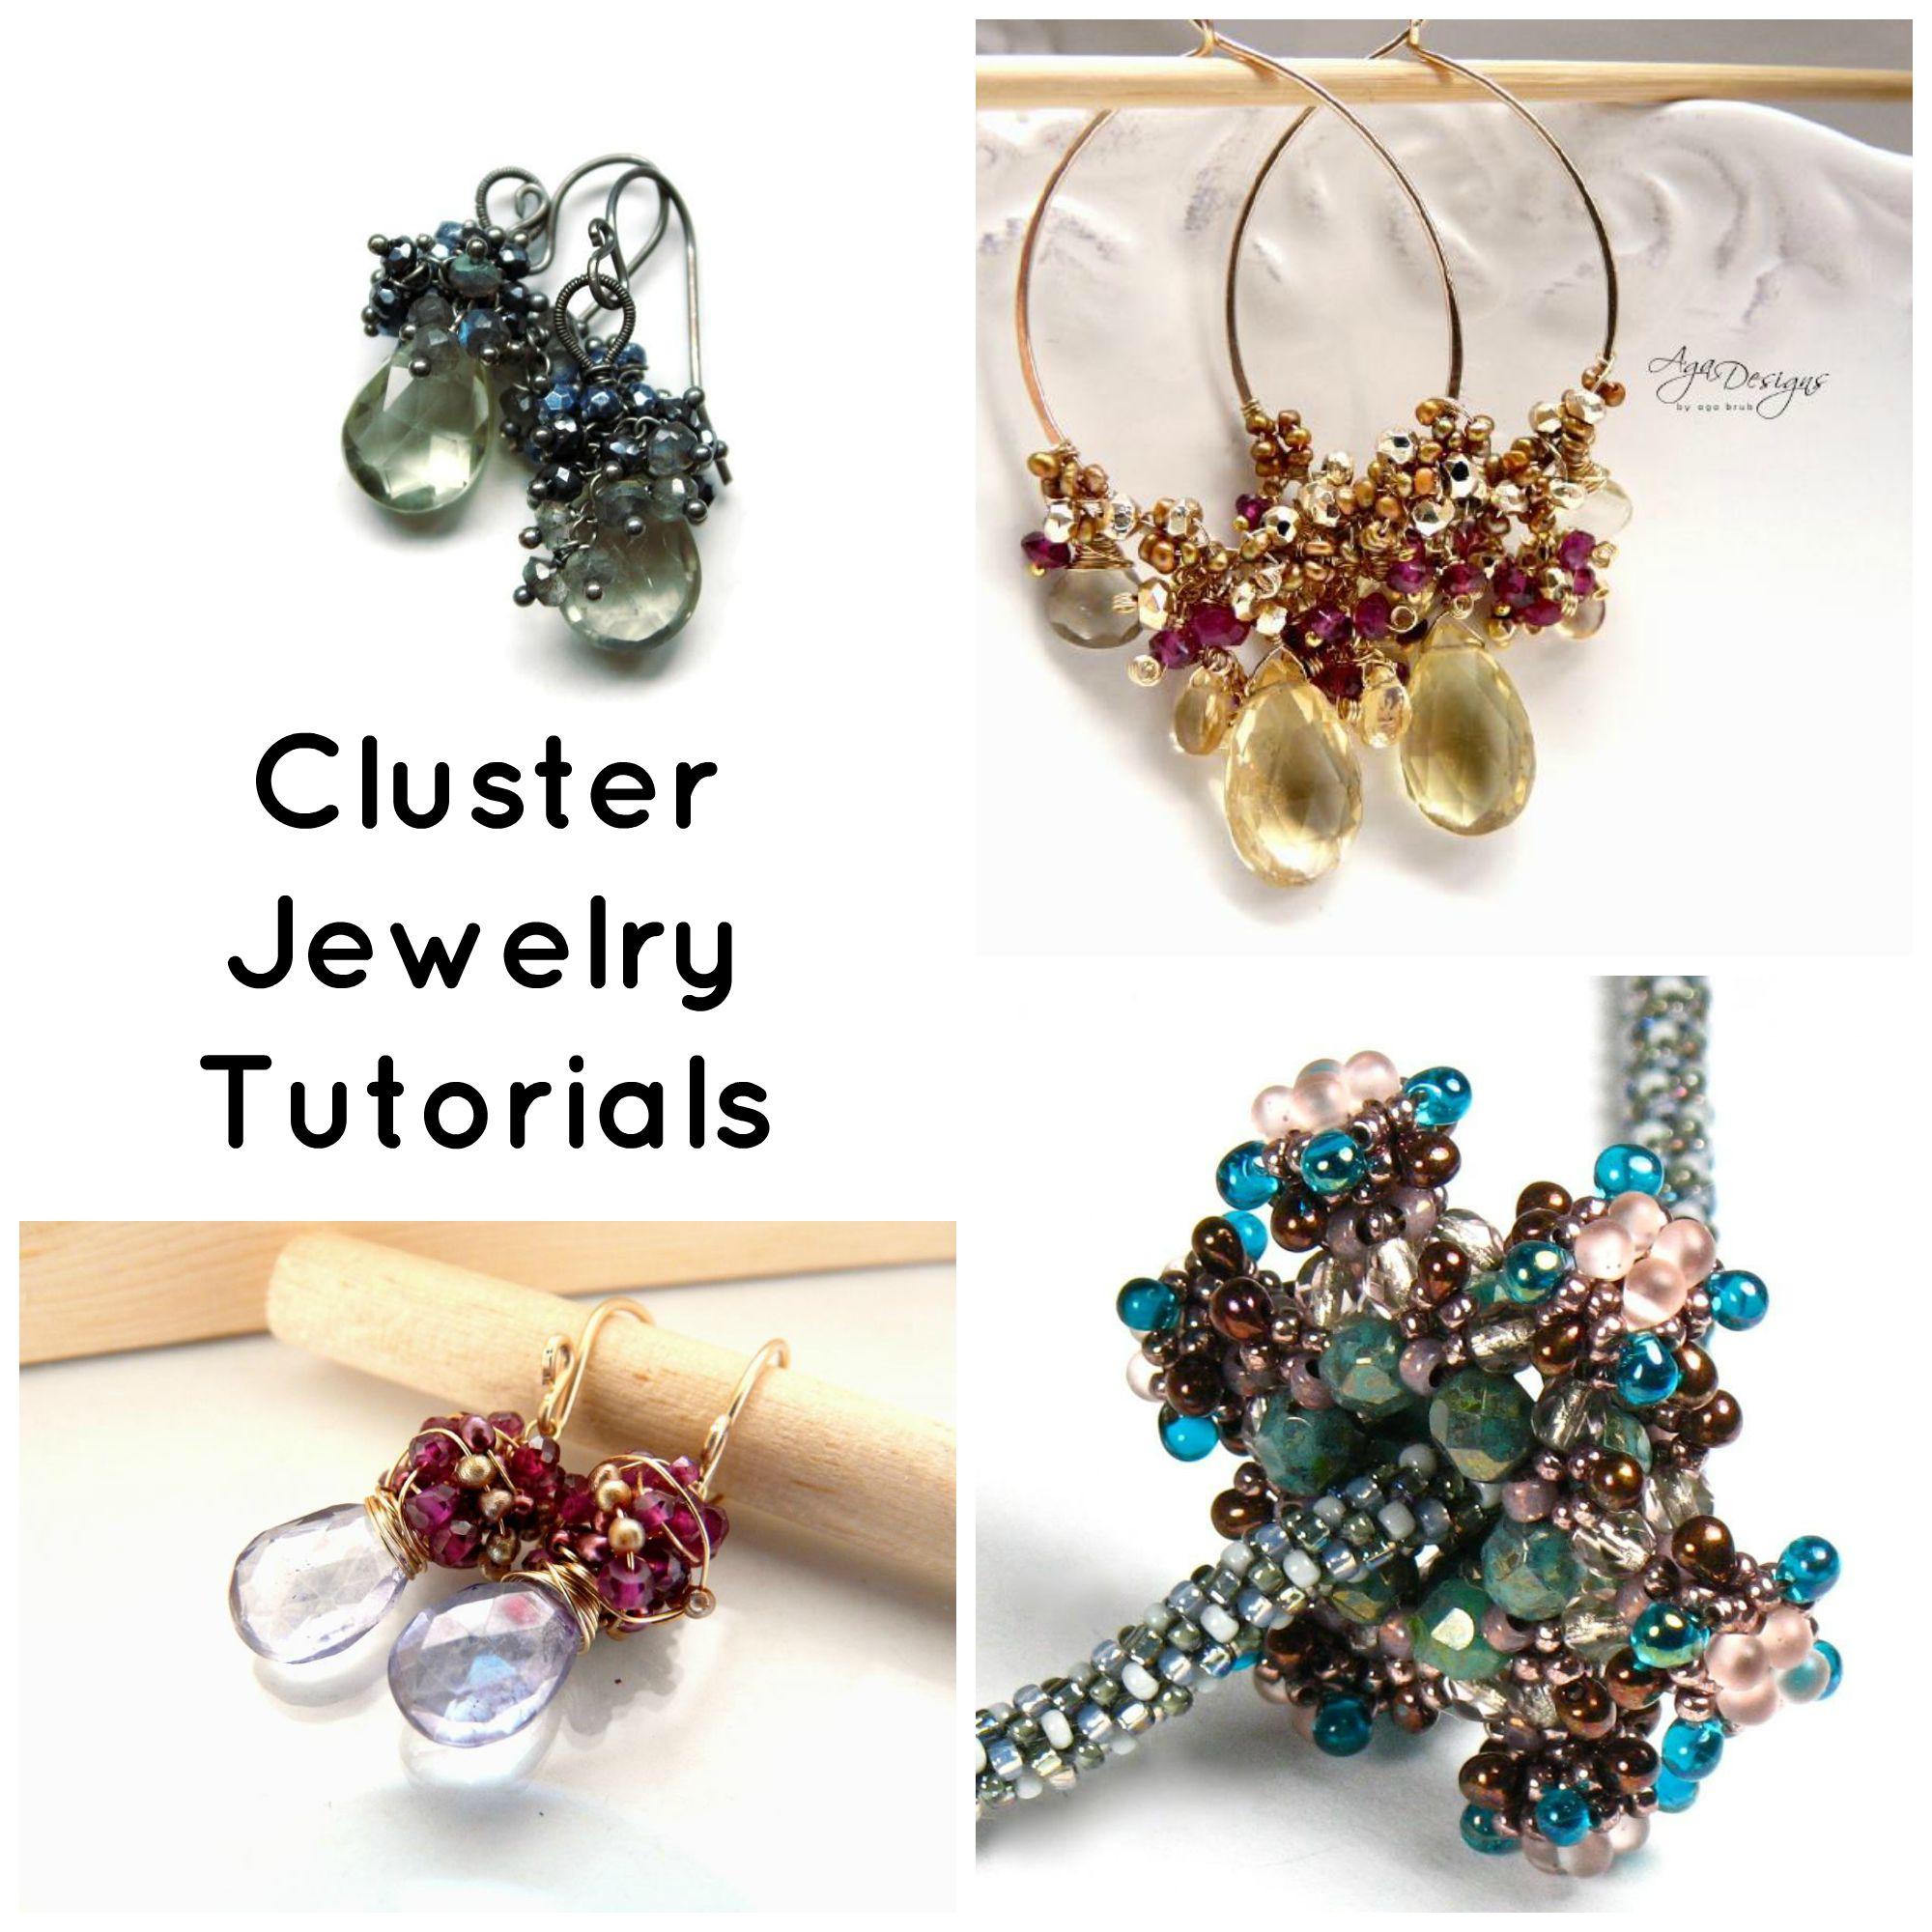 Cluster Jewelry Tutorials